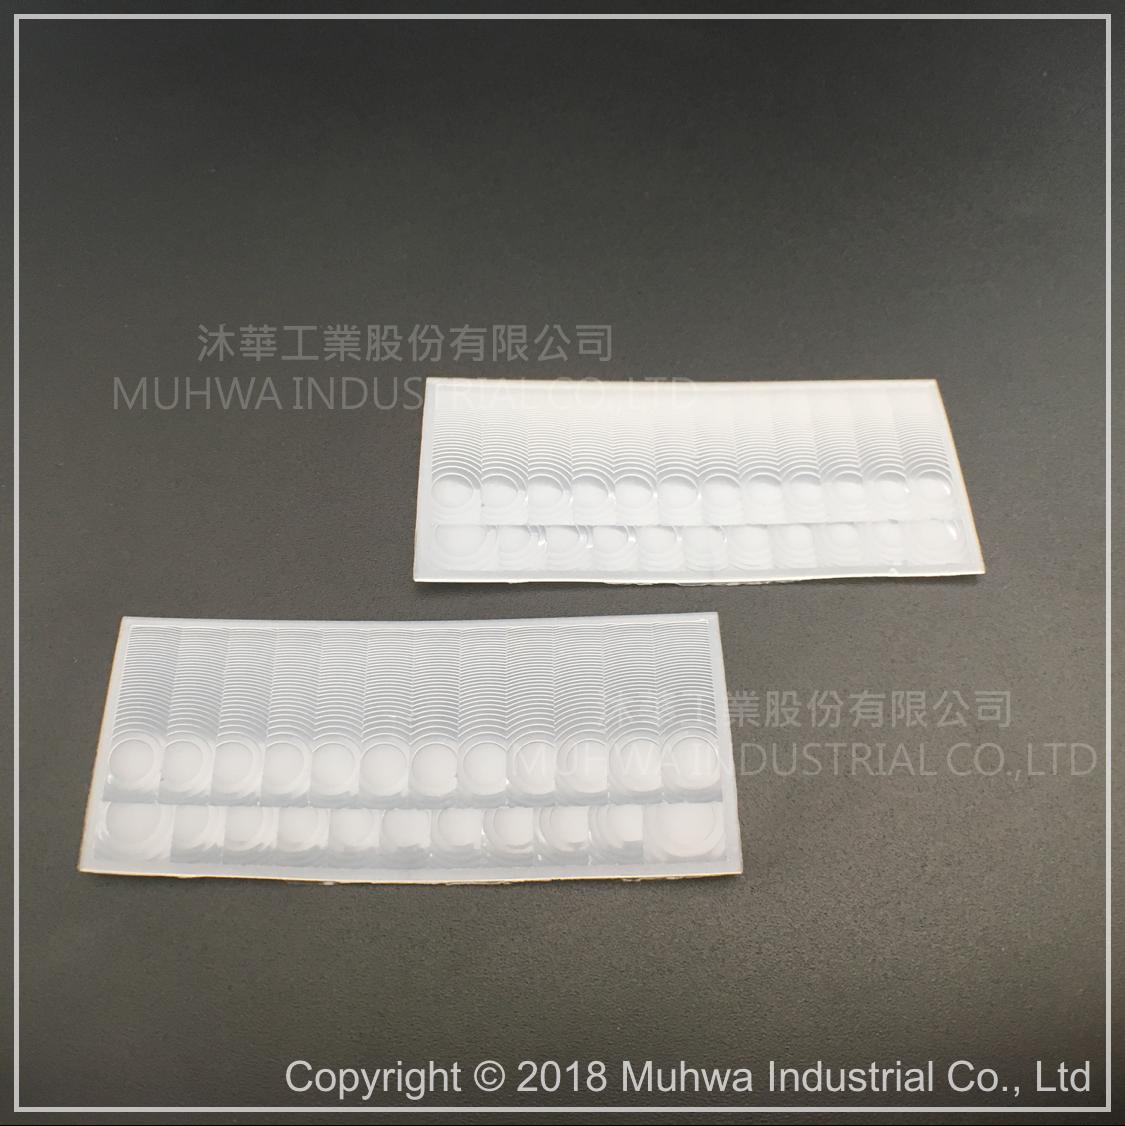 High quality Fresnel Lens For Pir Sensor Quotes,China Fresnel Lens For Pir Sensor Factory,Fresnel Lens For Pir Sensor Purchasing